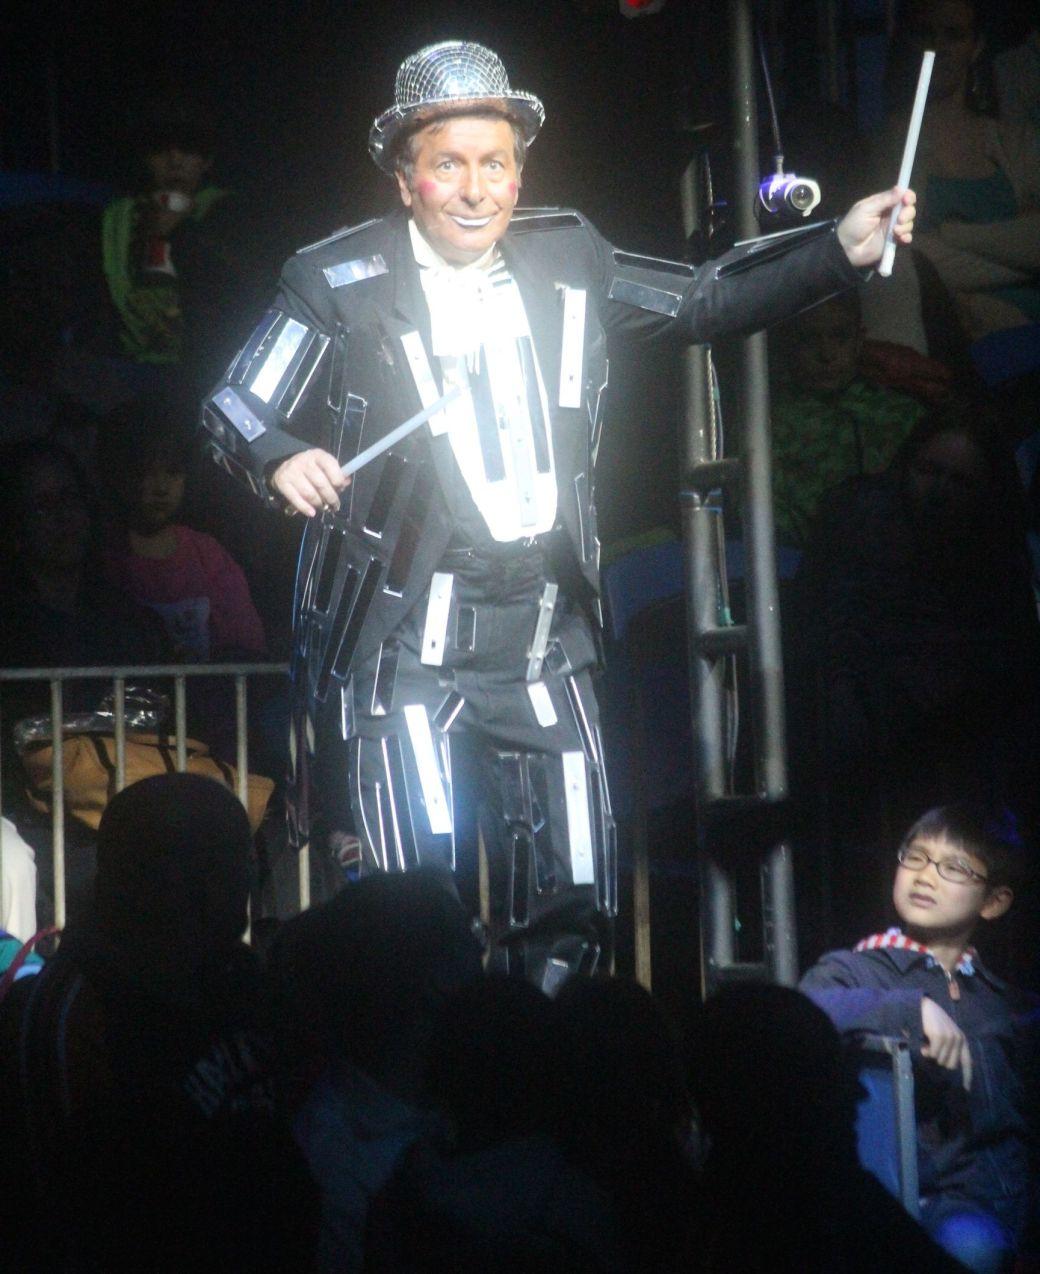 boston big apple circus performance april 29 2015 ringmaster 3